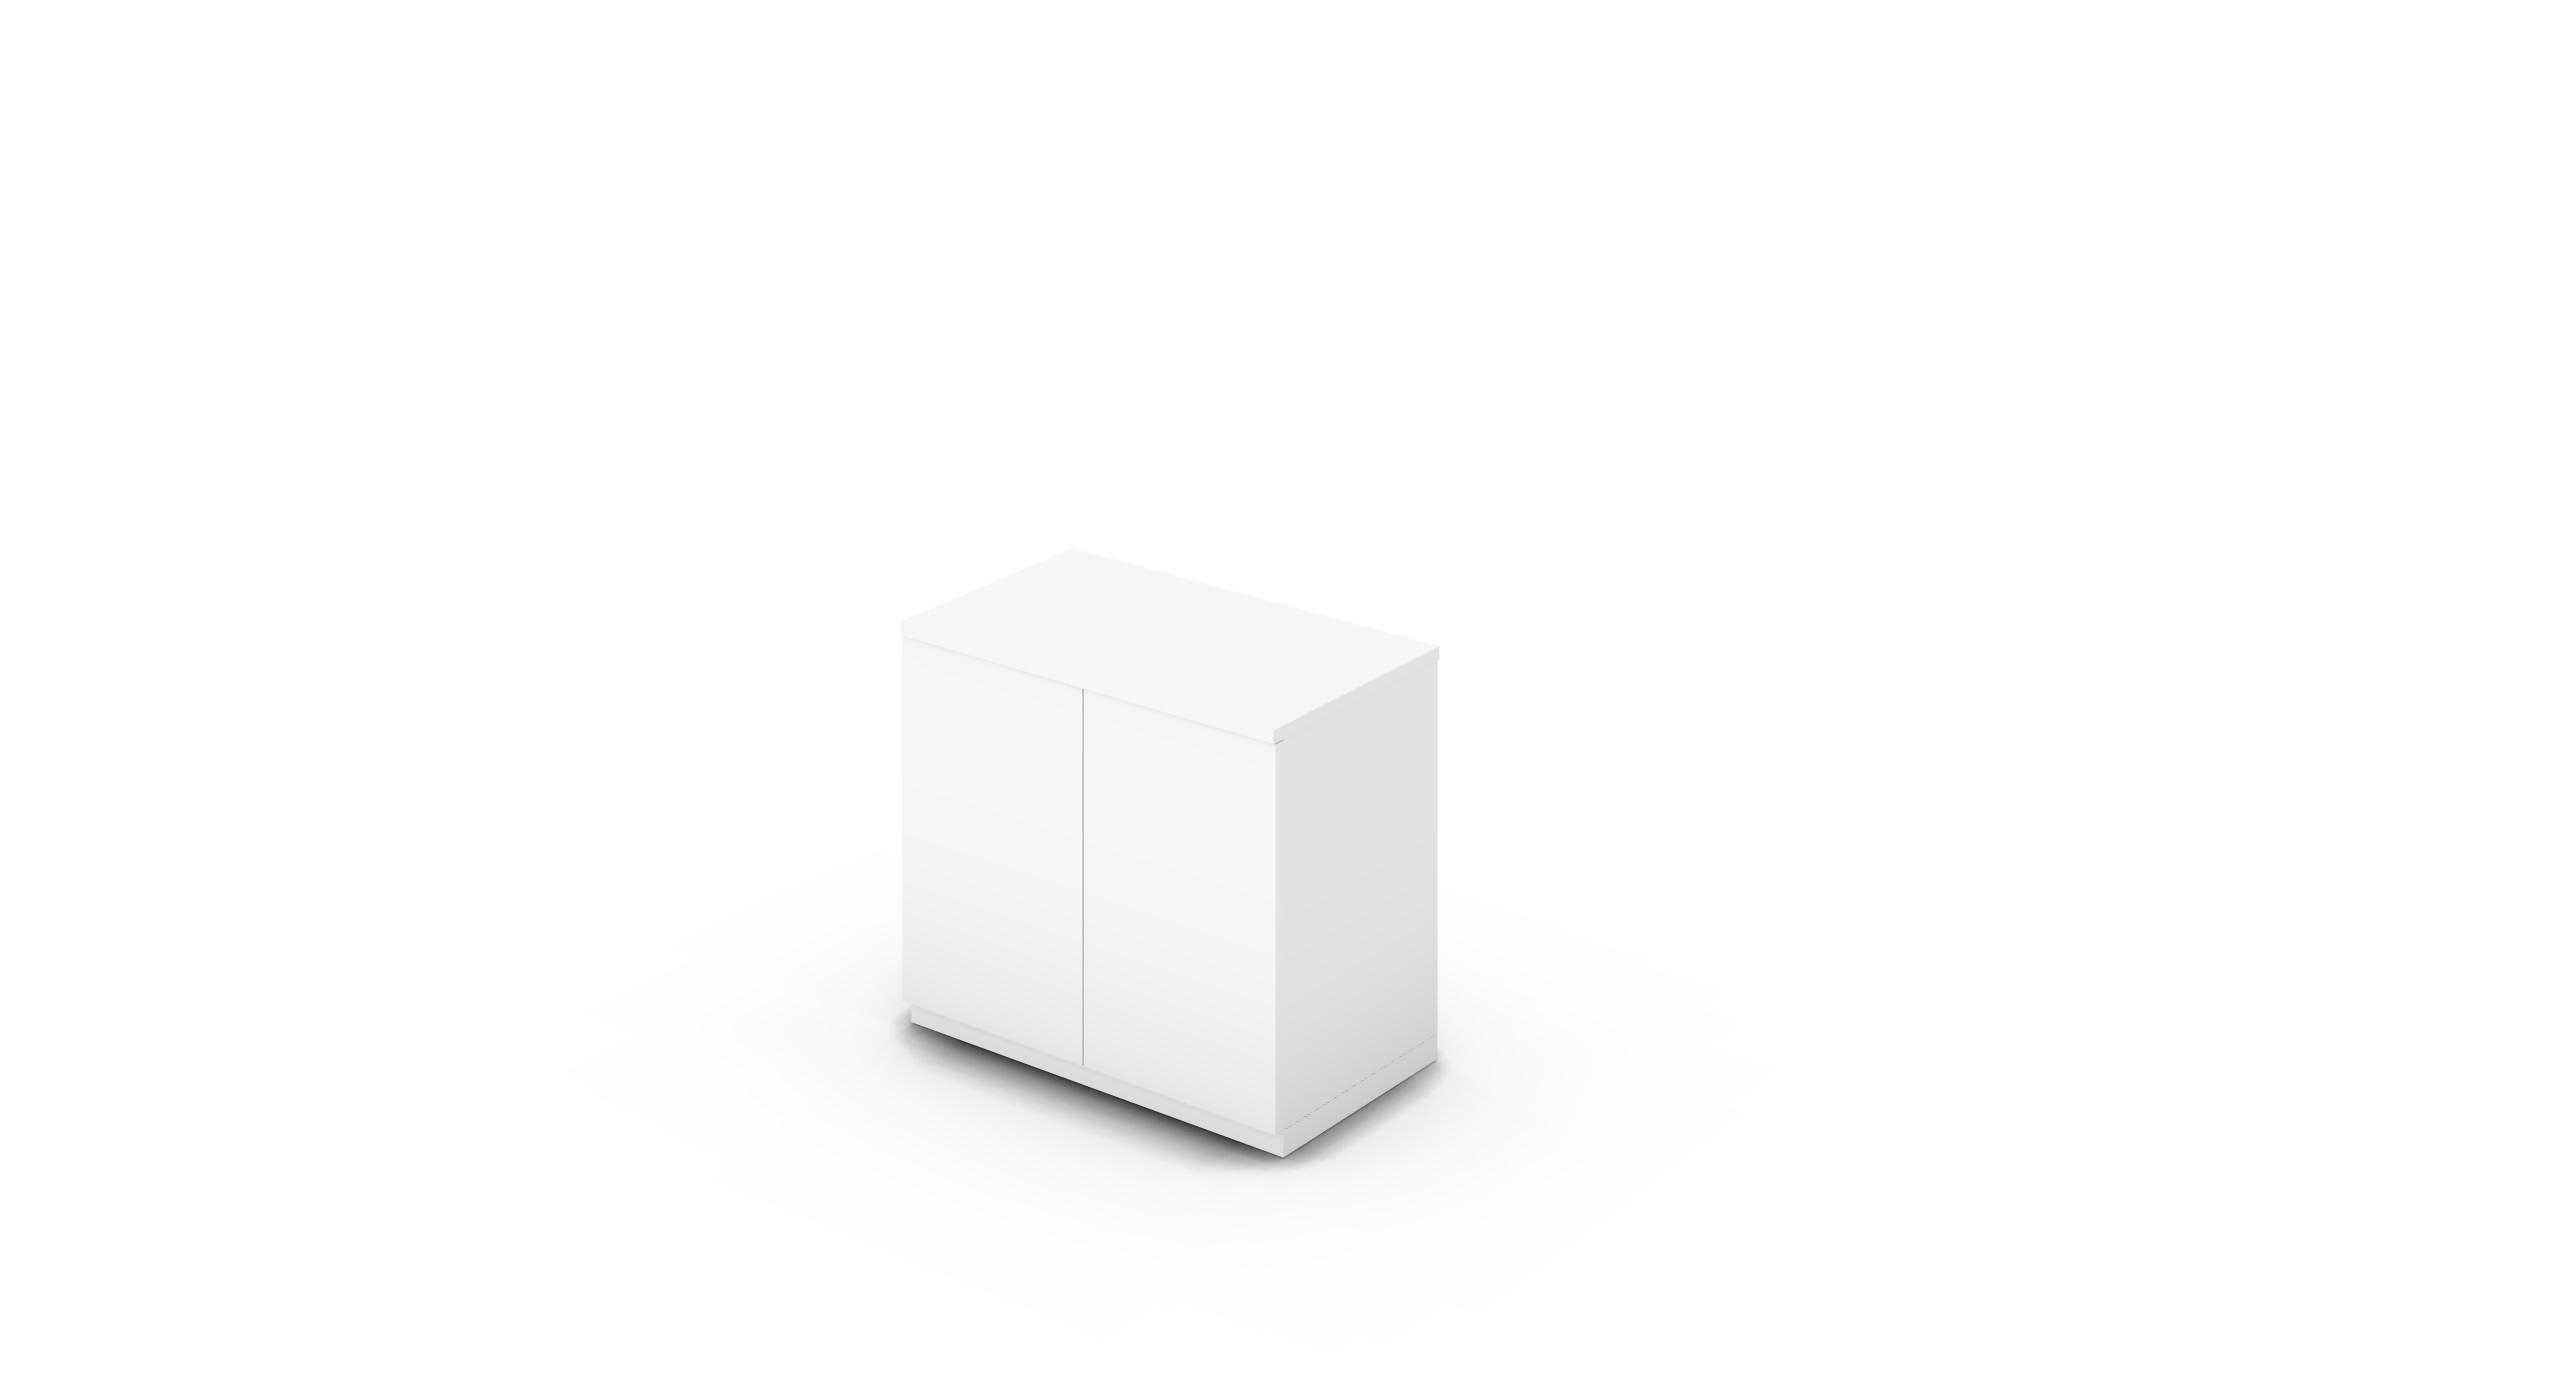 Cabinet_800x450x775_HD_White_Push_NoCylinder